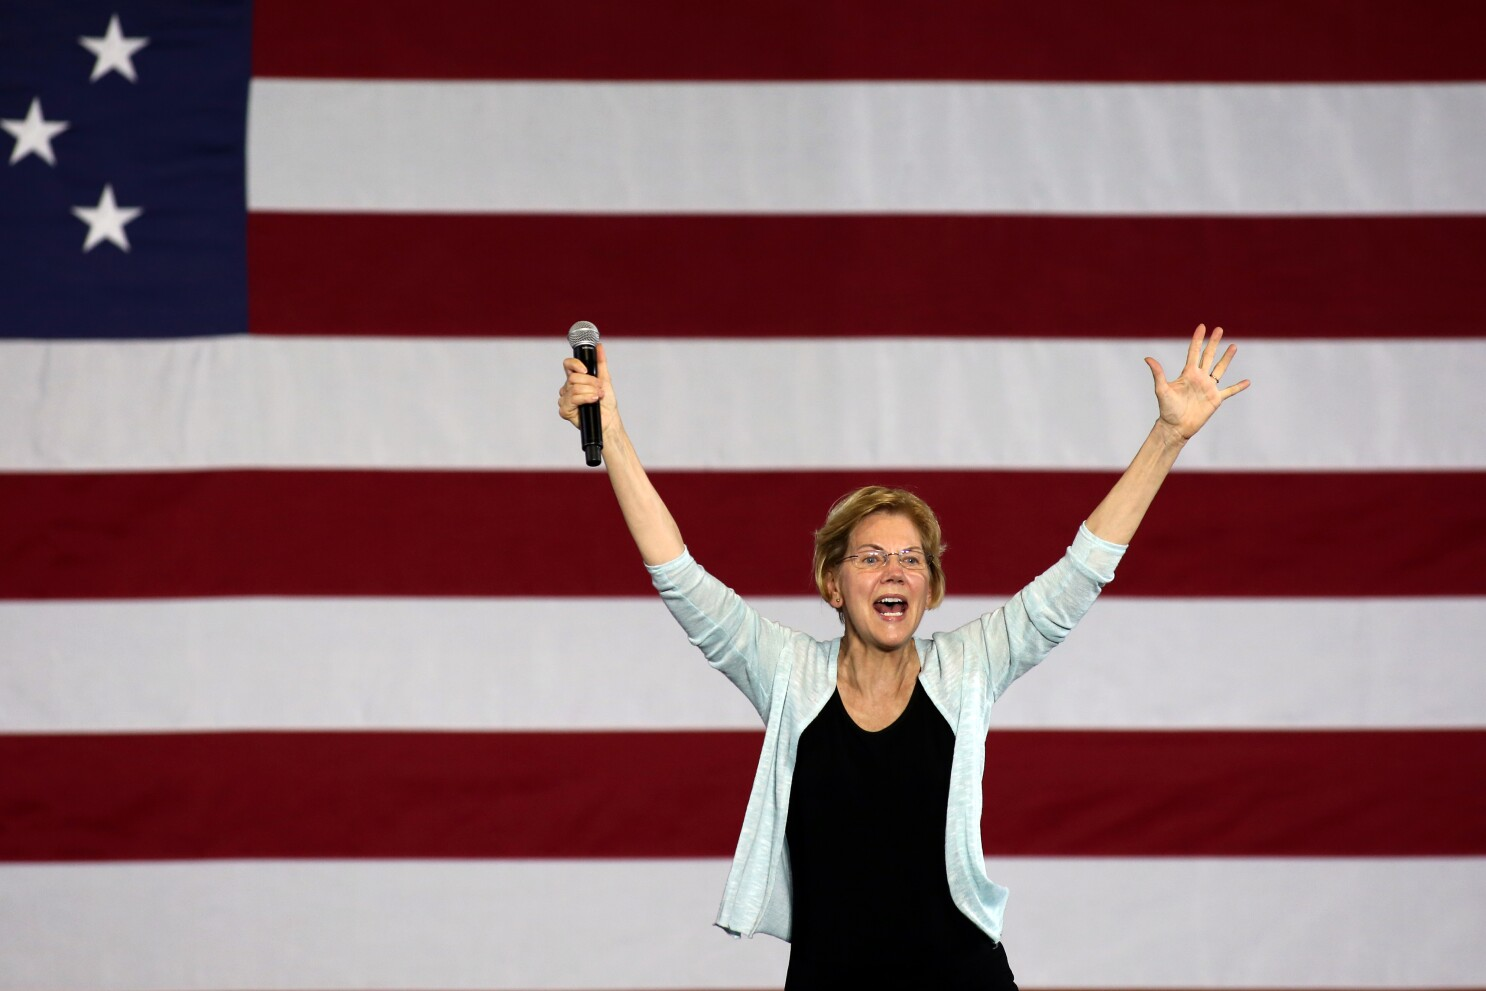 2020 Democratic candidate Elizabeth Warren holds L.A. town hall